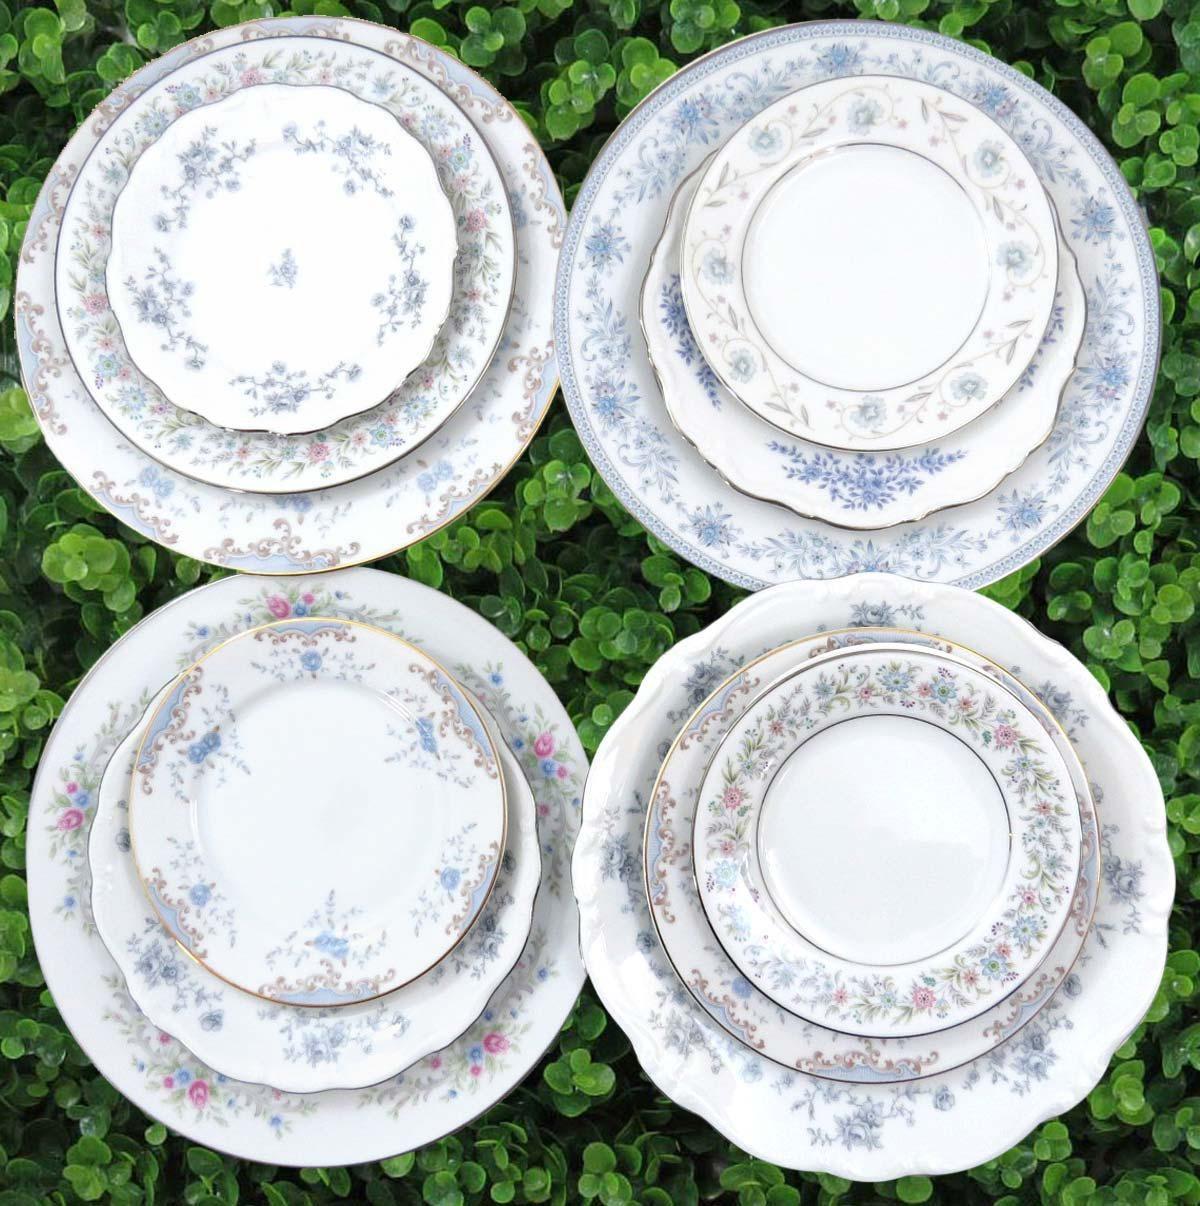 Vintage Mismatched Fine China Dinnerware Set - Service for 4 - Image 2 of 11  sc 1 st  Chairish & Vintage Mismatched Fine China Dinnerware Set - Service for 4 | Chairish